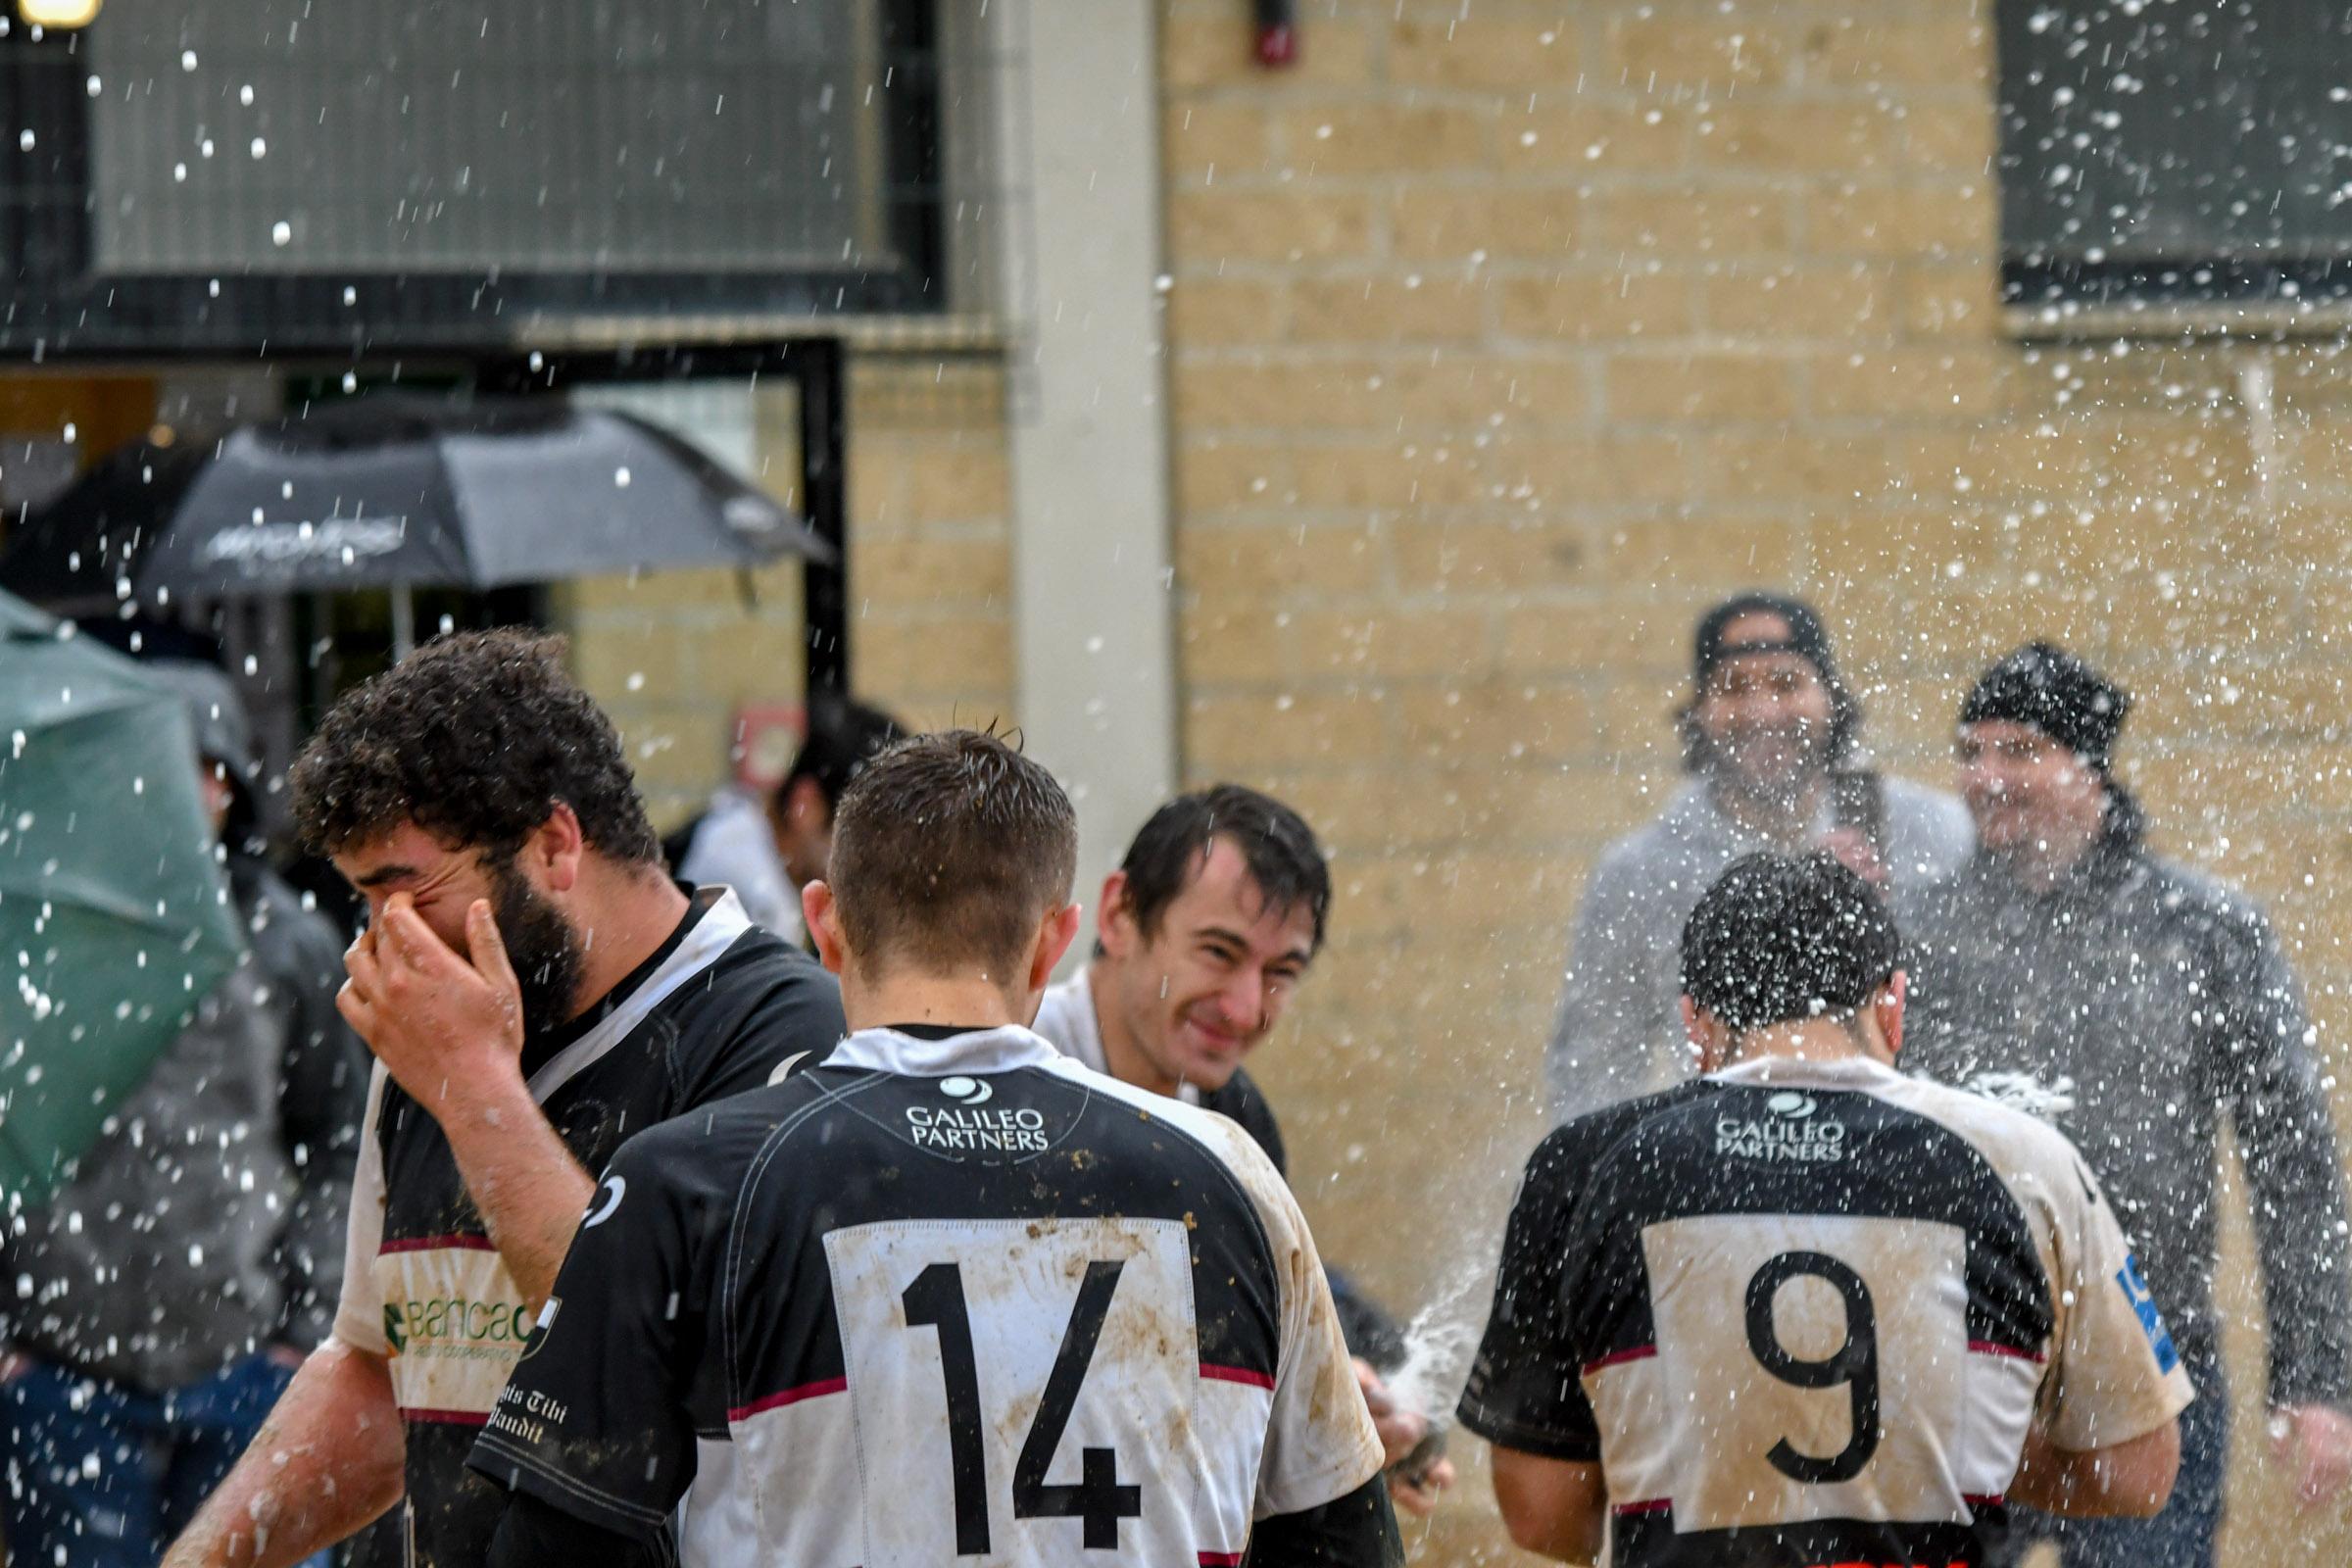 Banca CRAS CUS Siena Rugby festeggia la salvezza sotto al diluvio.